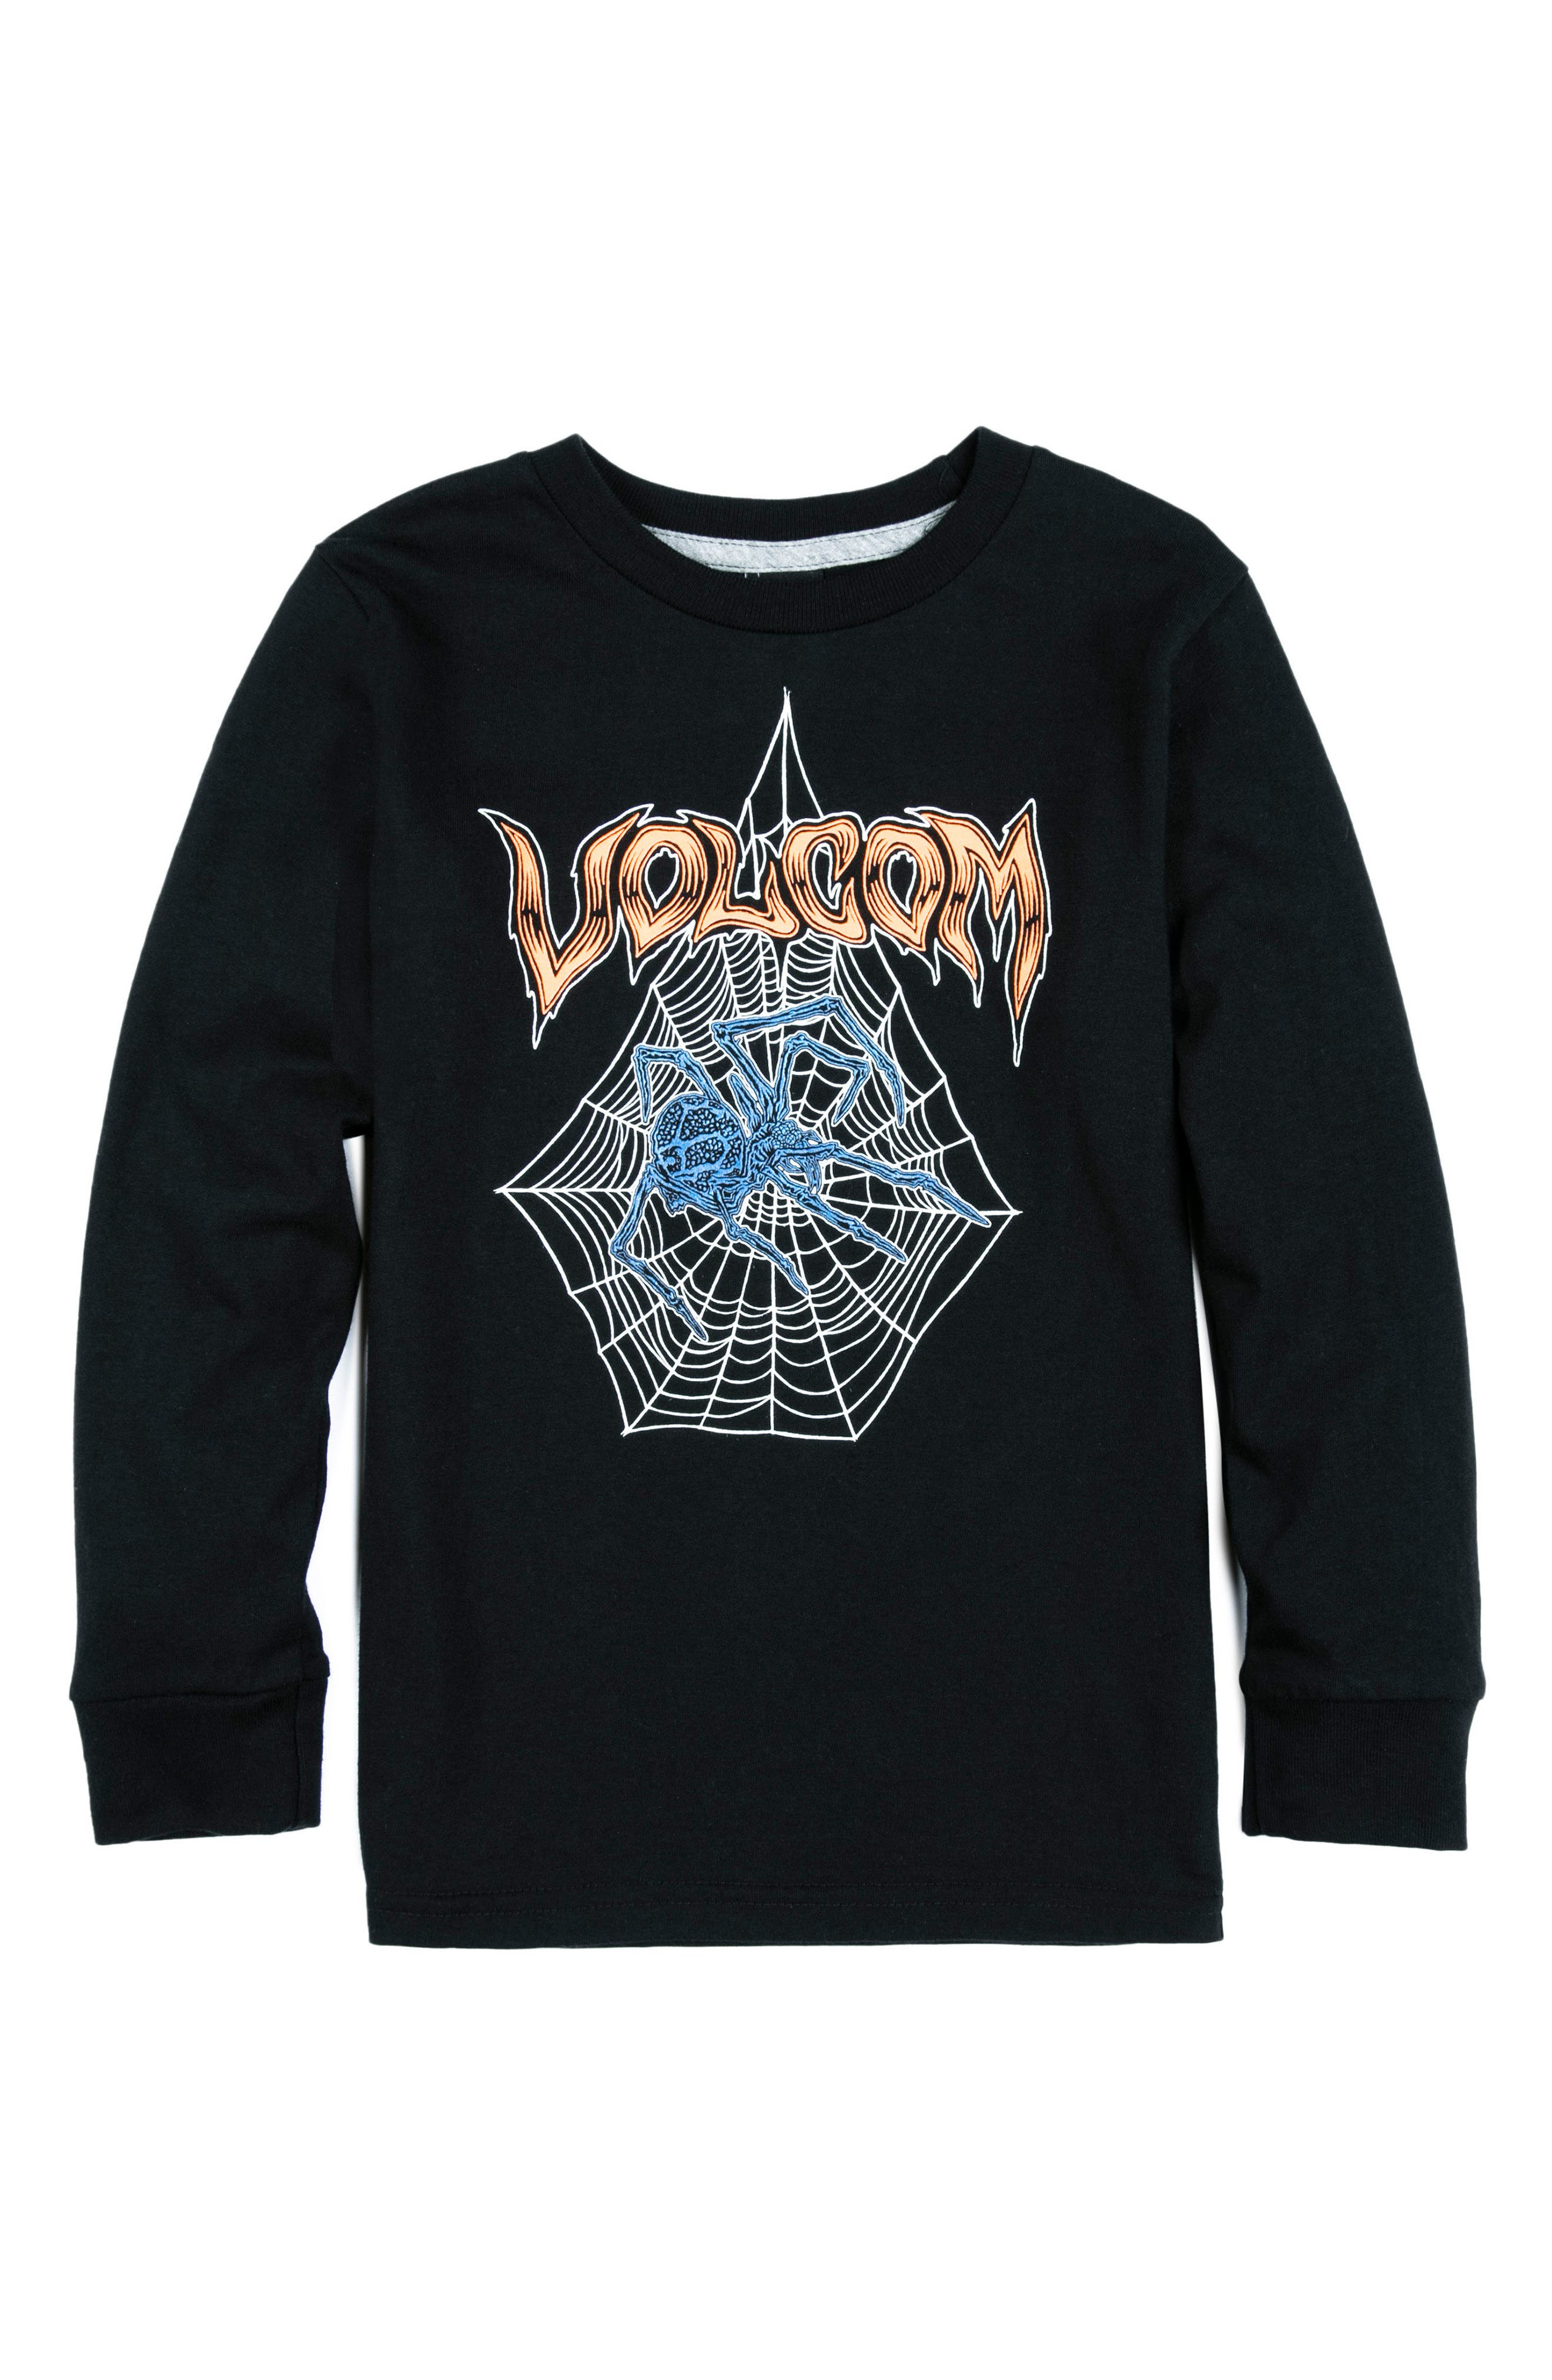 Main Image - Volcom Venom Spider Glow-in-the-Dark Long Sleeve T-Shirt (Toddler Boys & Little Boys)